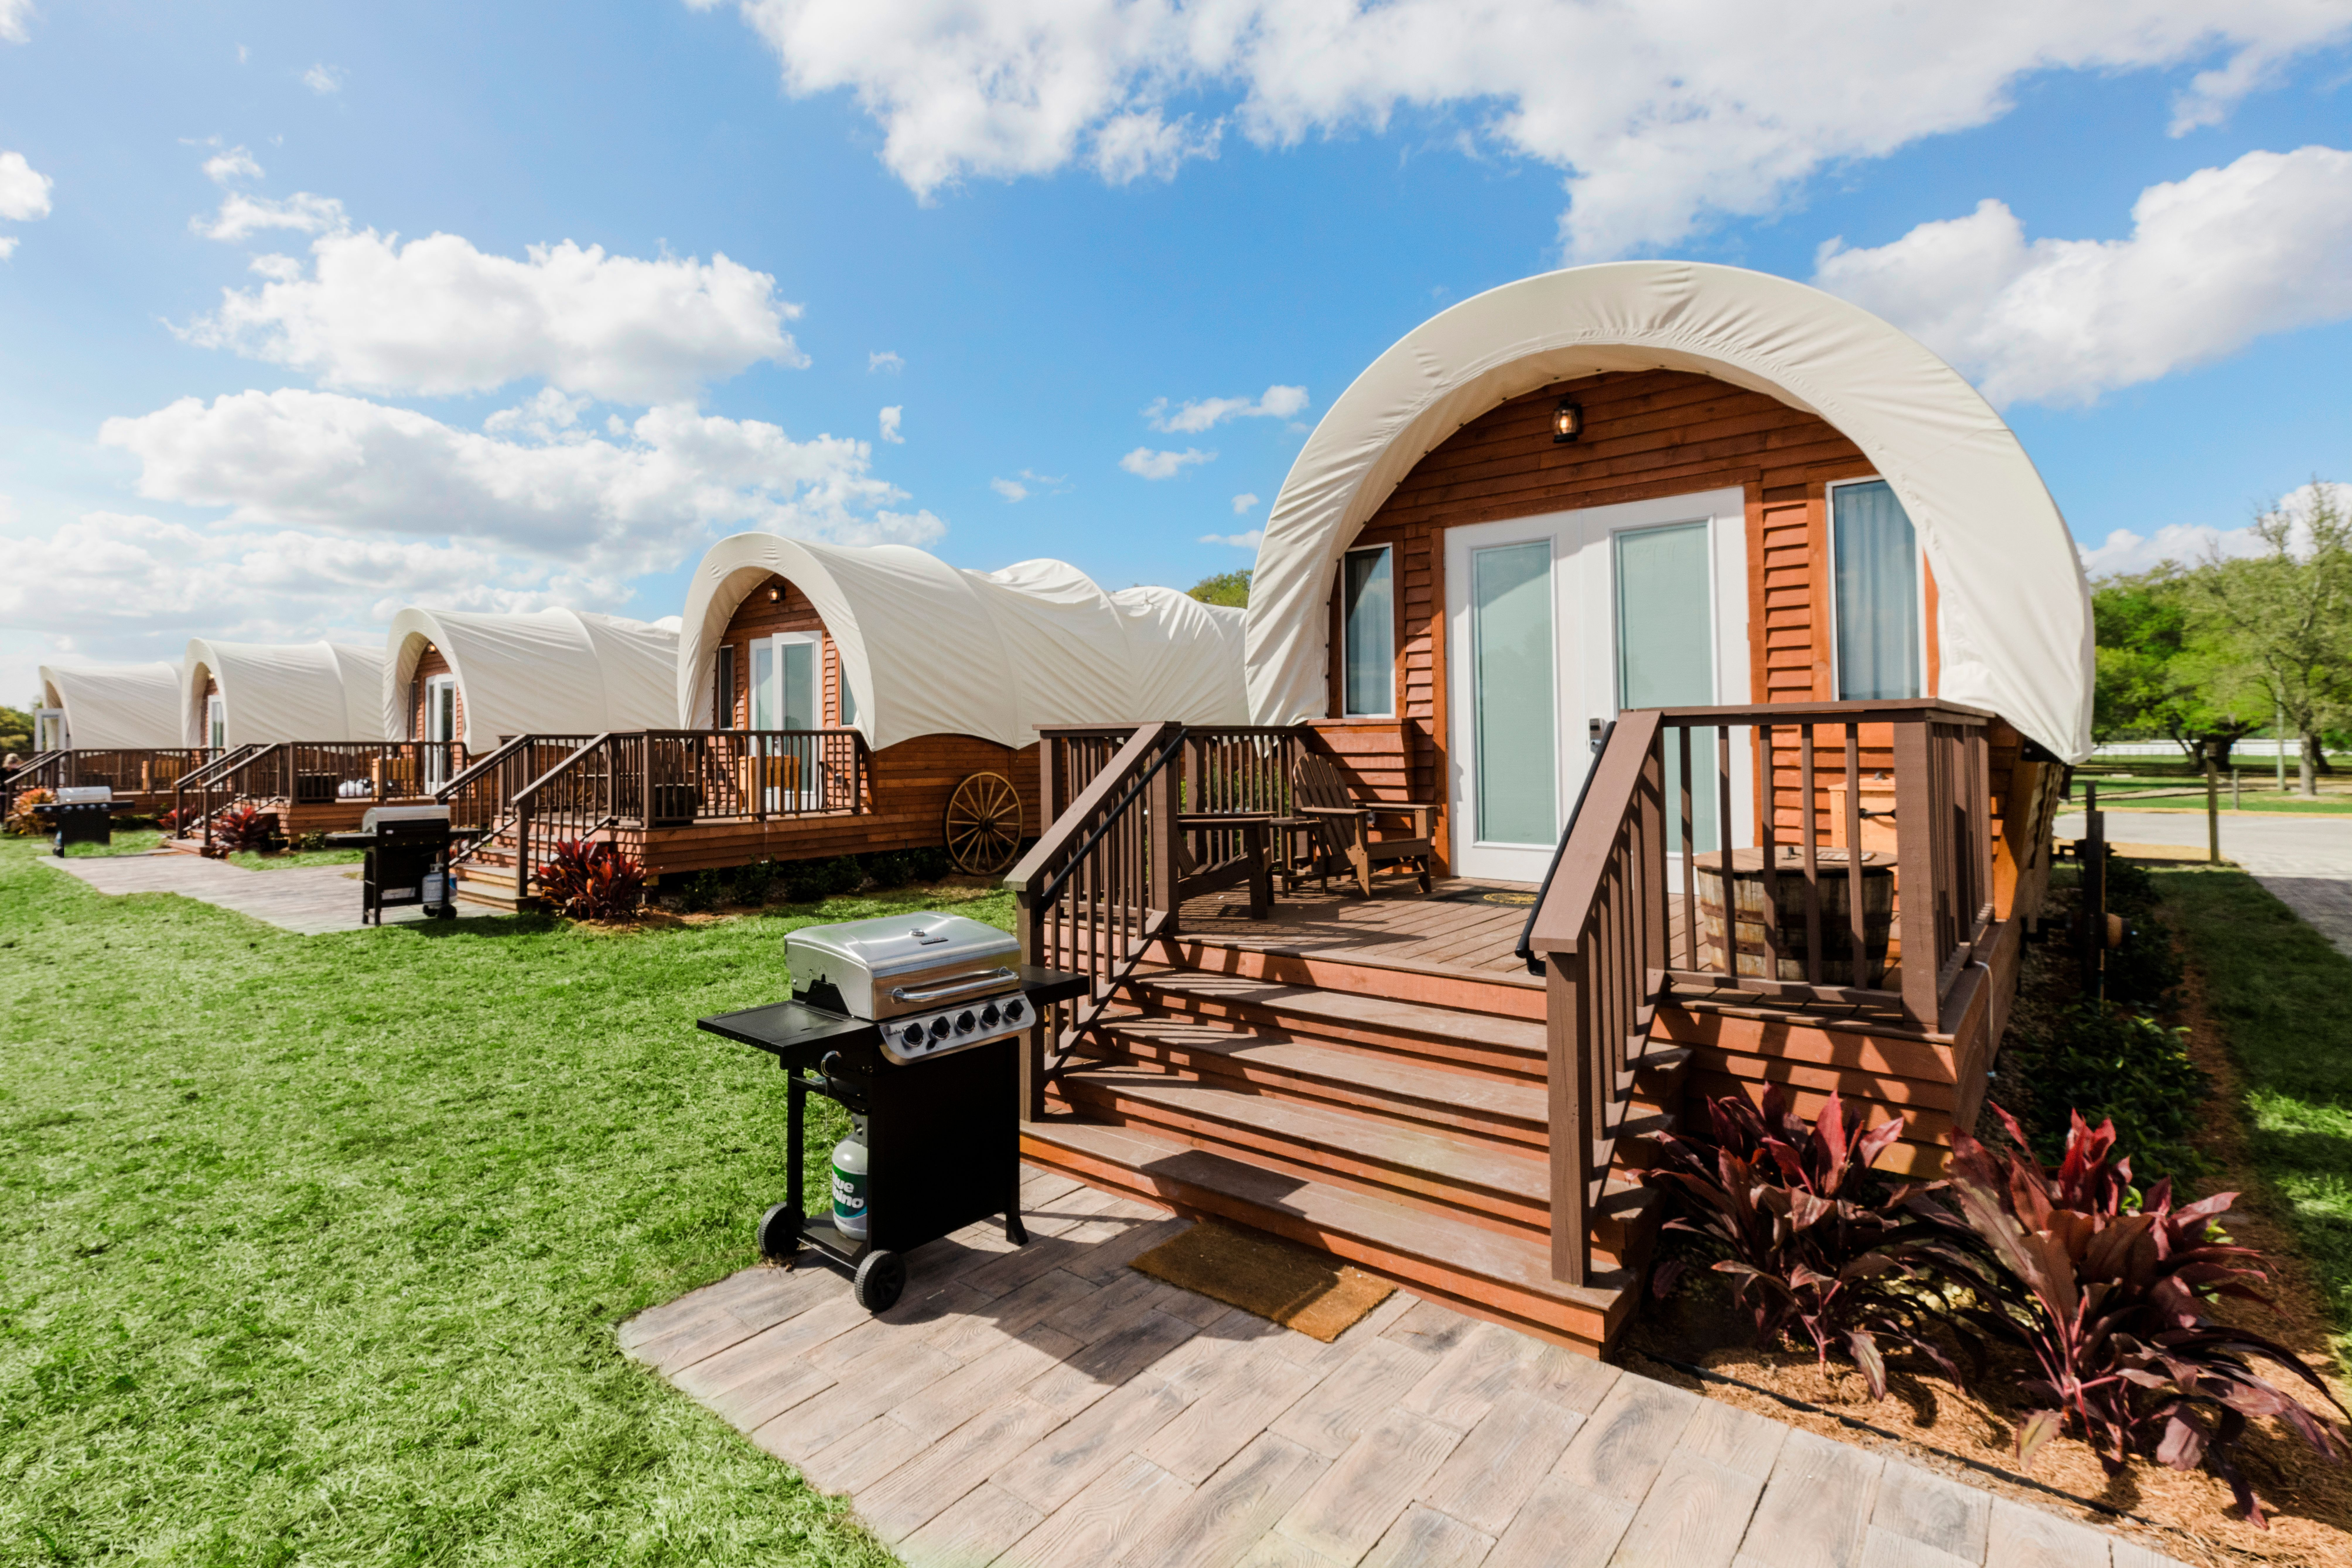 Luxe Conestoga Wagon | Westgate River Ranch Resort